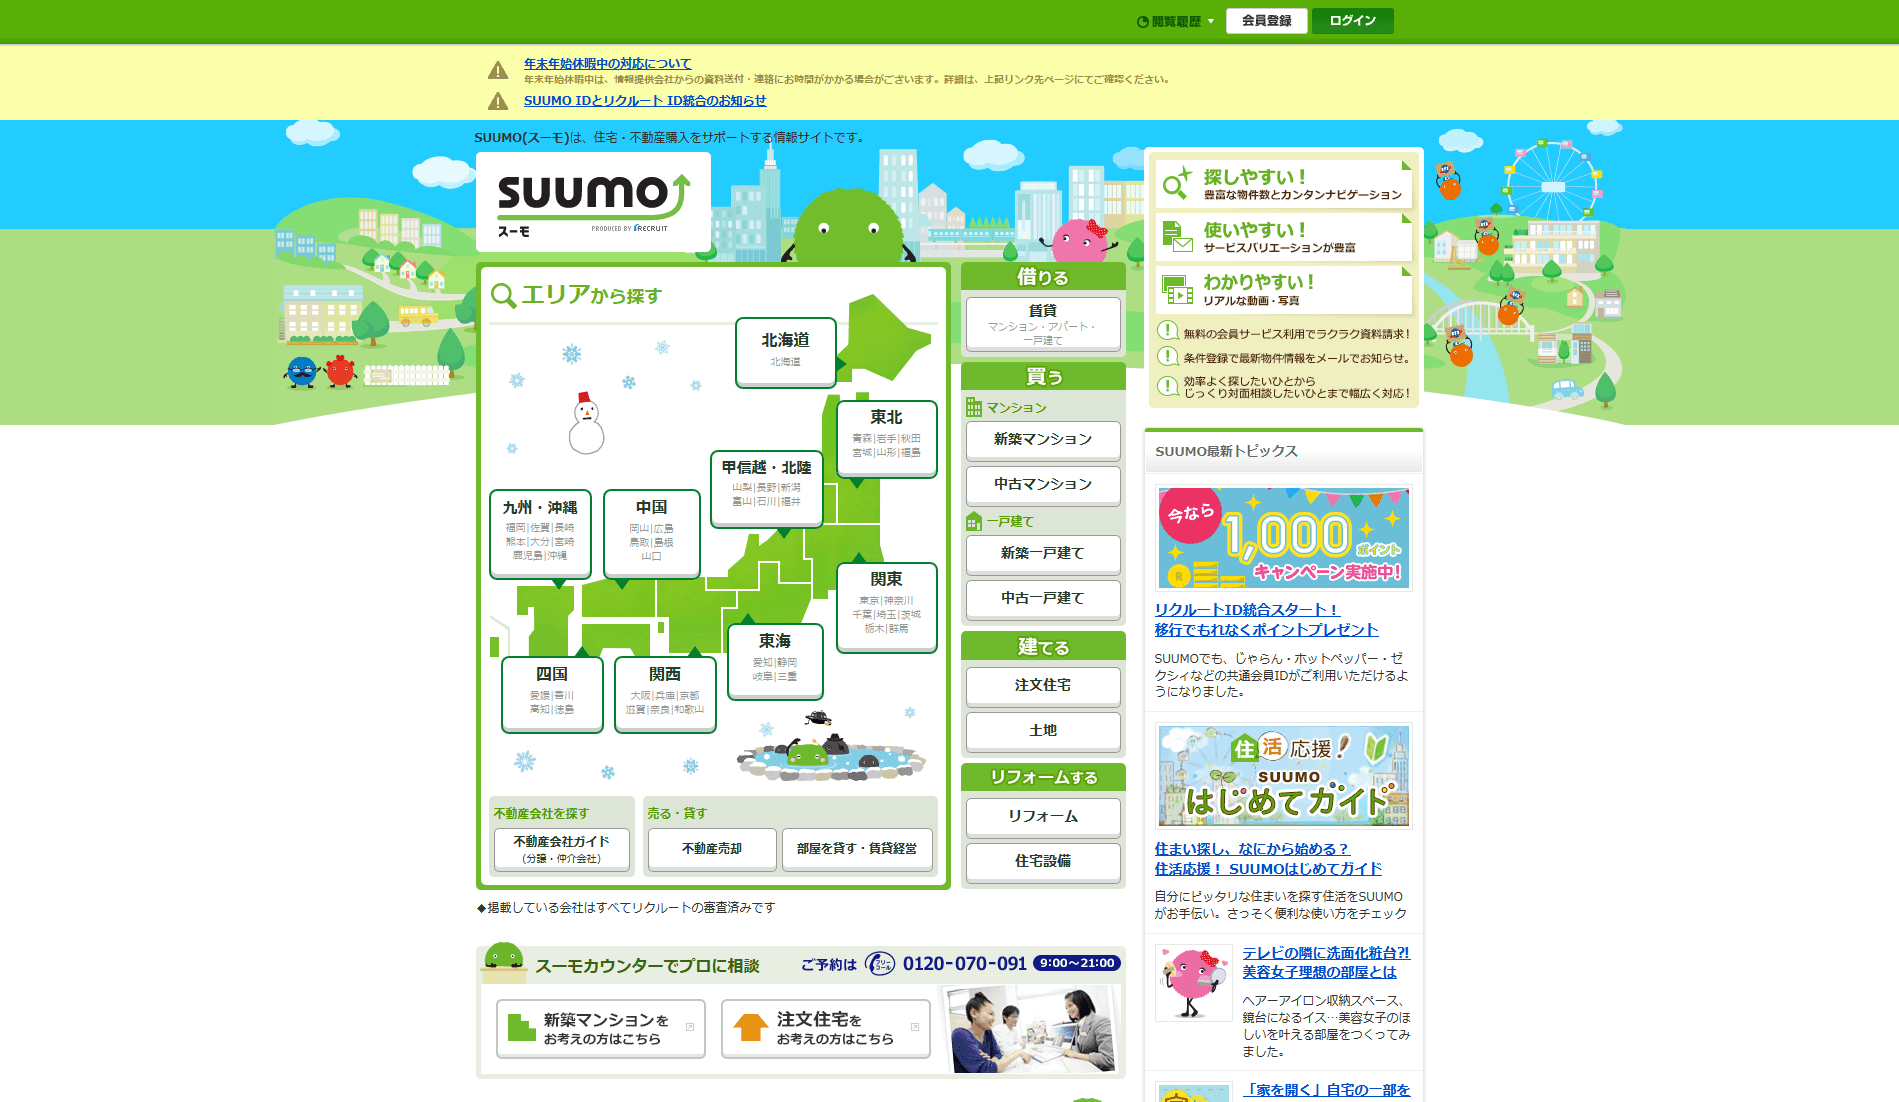 【SUUMO】 不動産売買・住宅購入・賃貸情報ならリクルートの不動産ポータルサイト